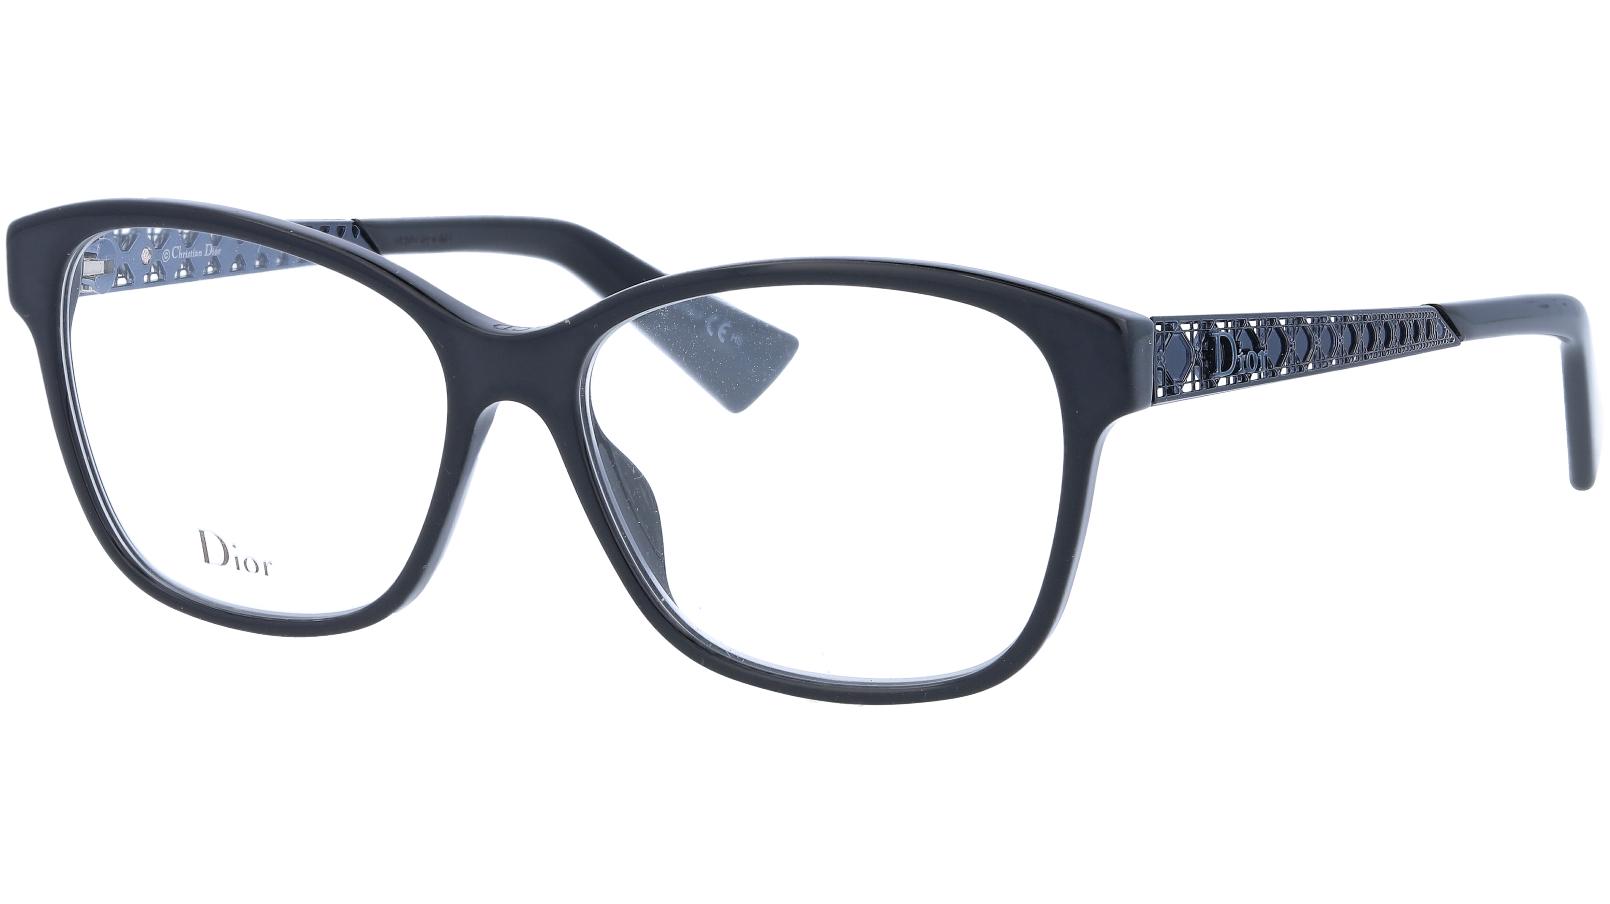 Dior AMAO4 807 55 Black Glasses